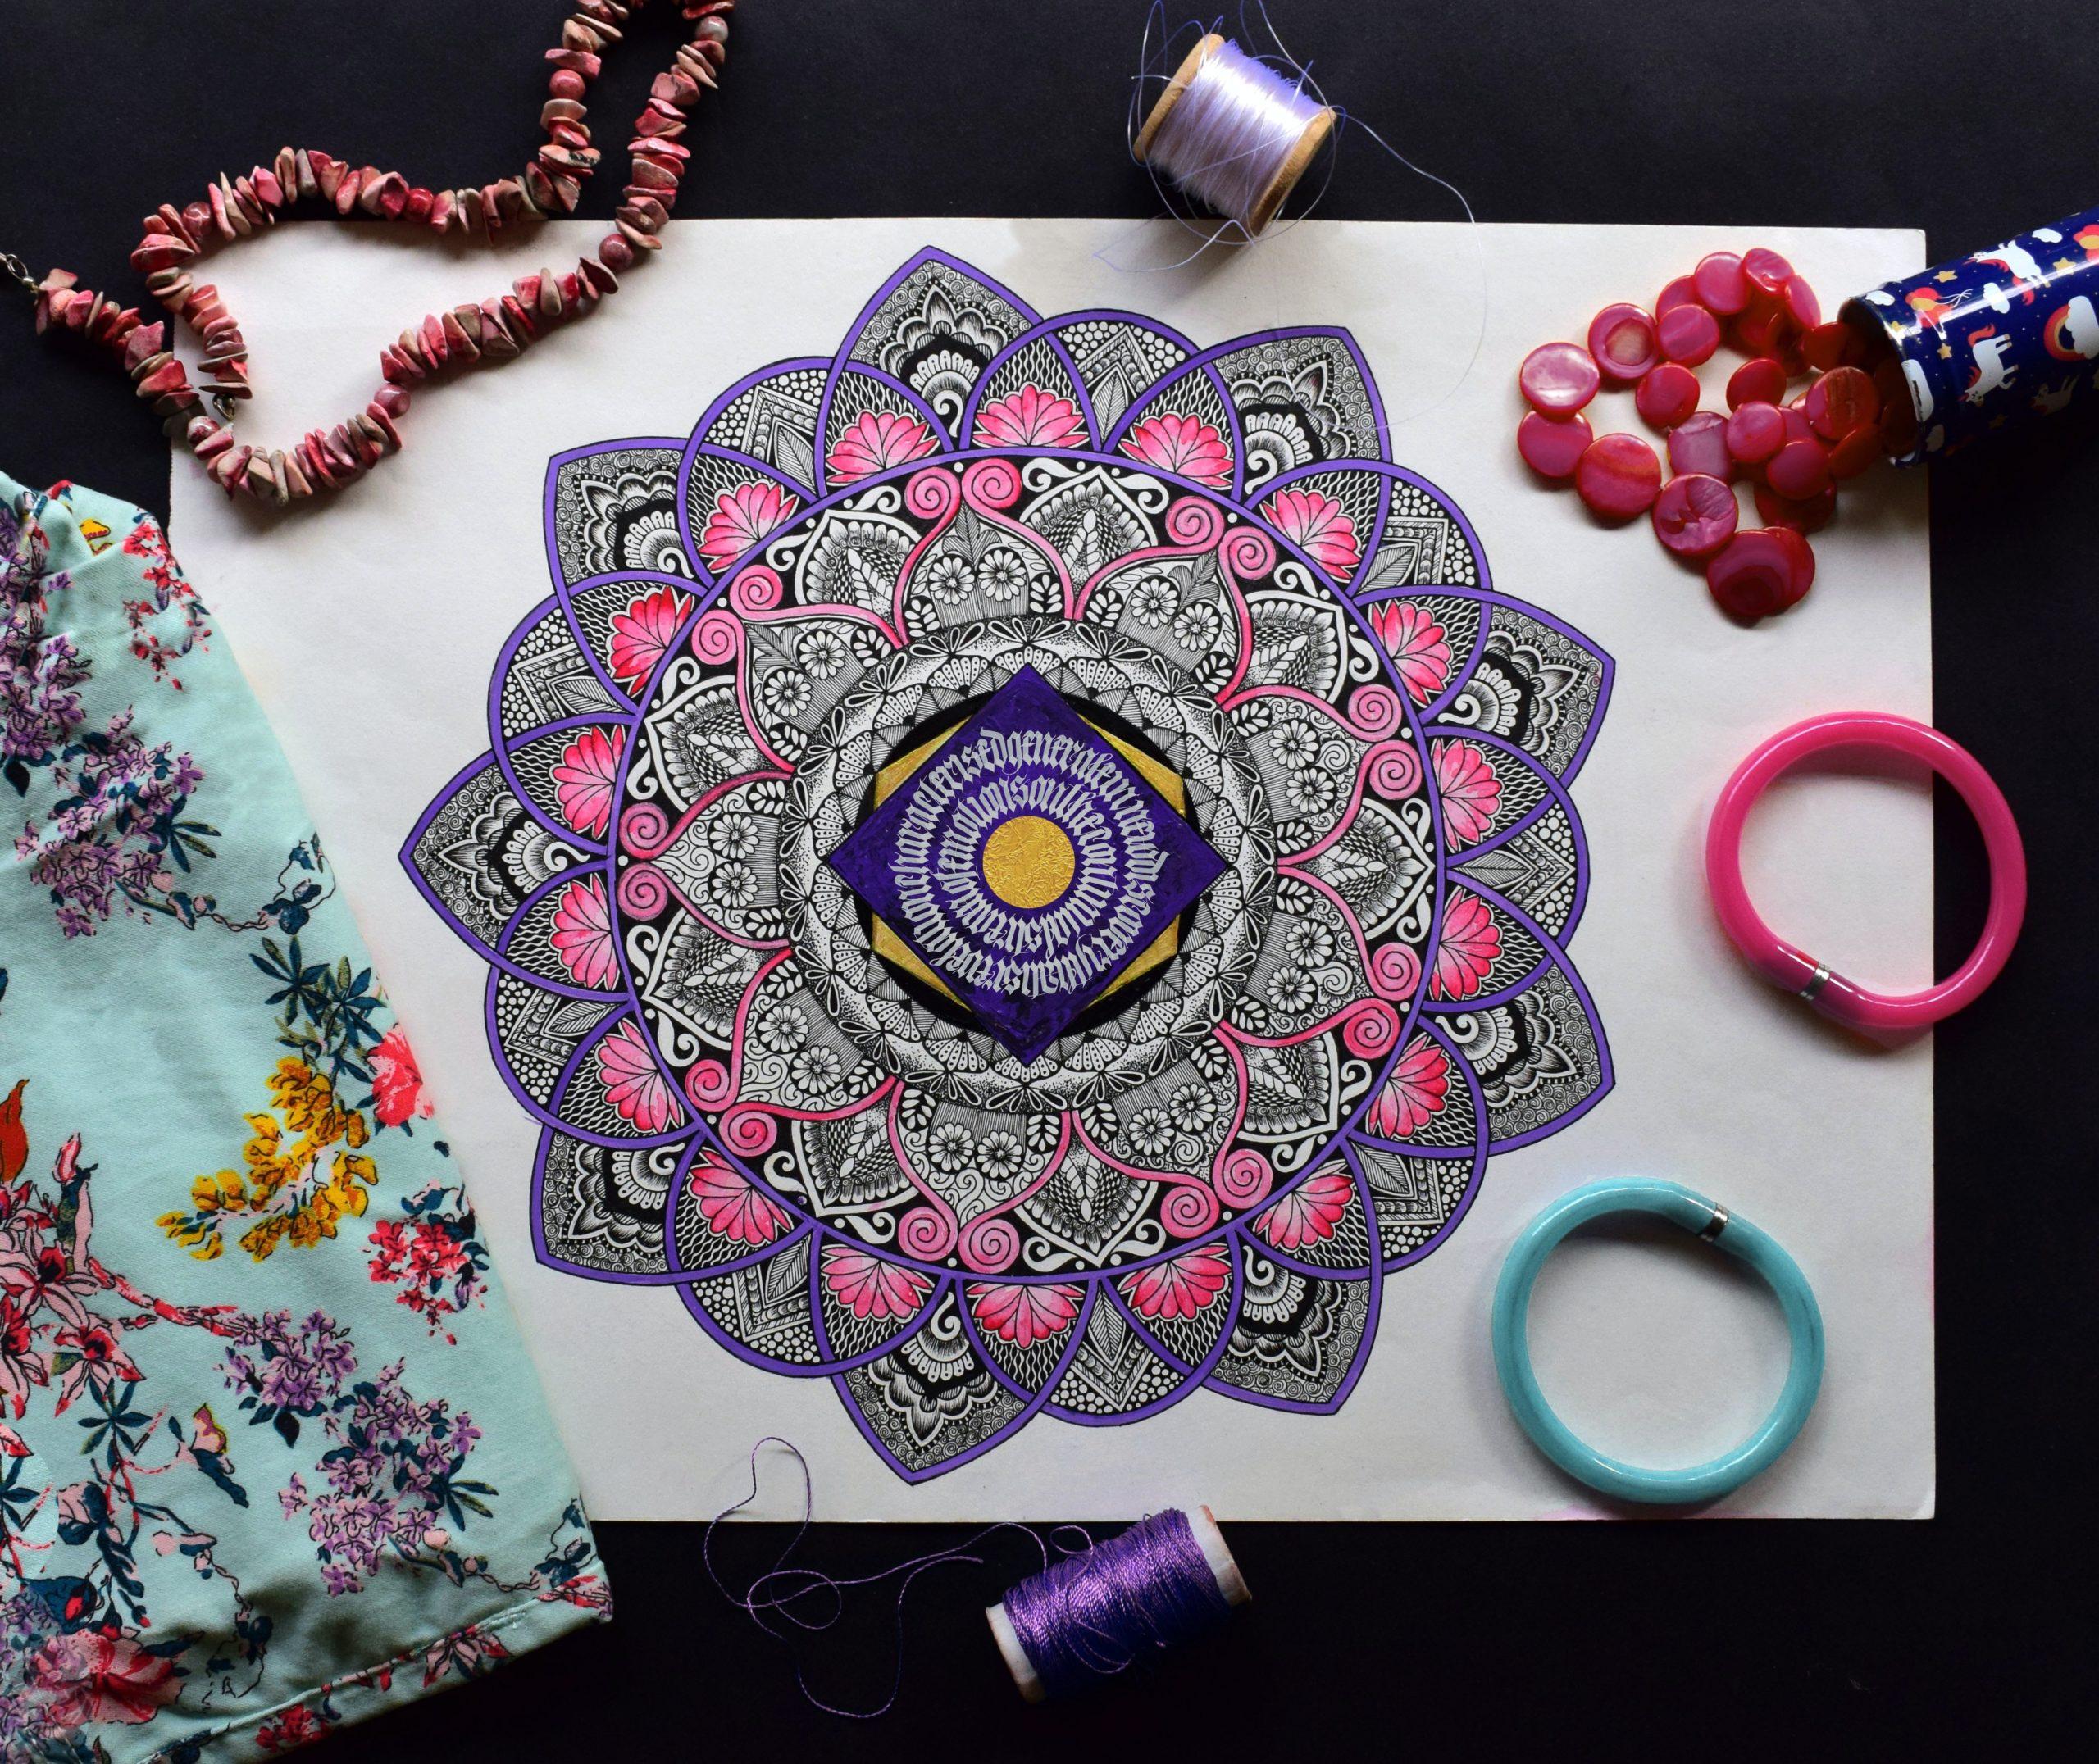 mandala in pink, purple, and blue